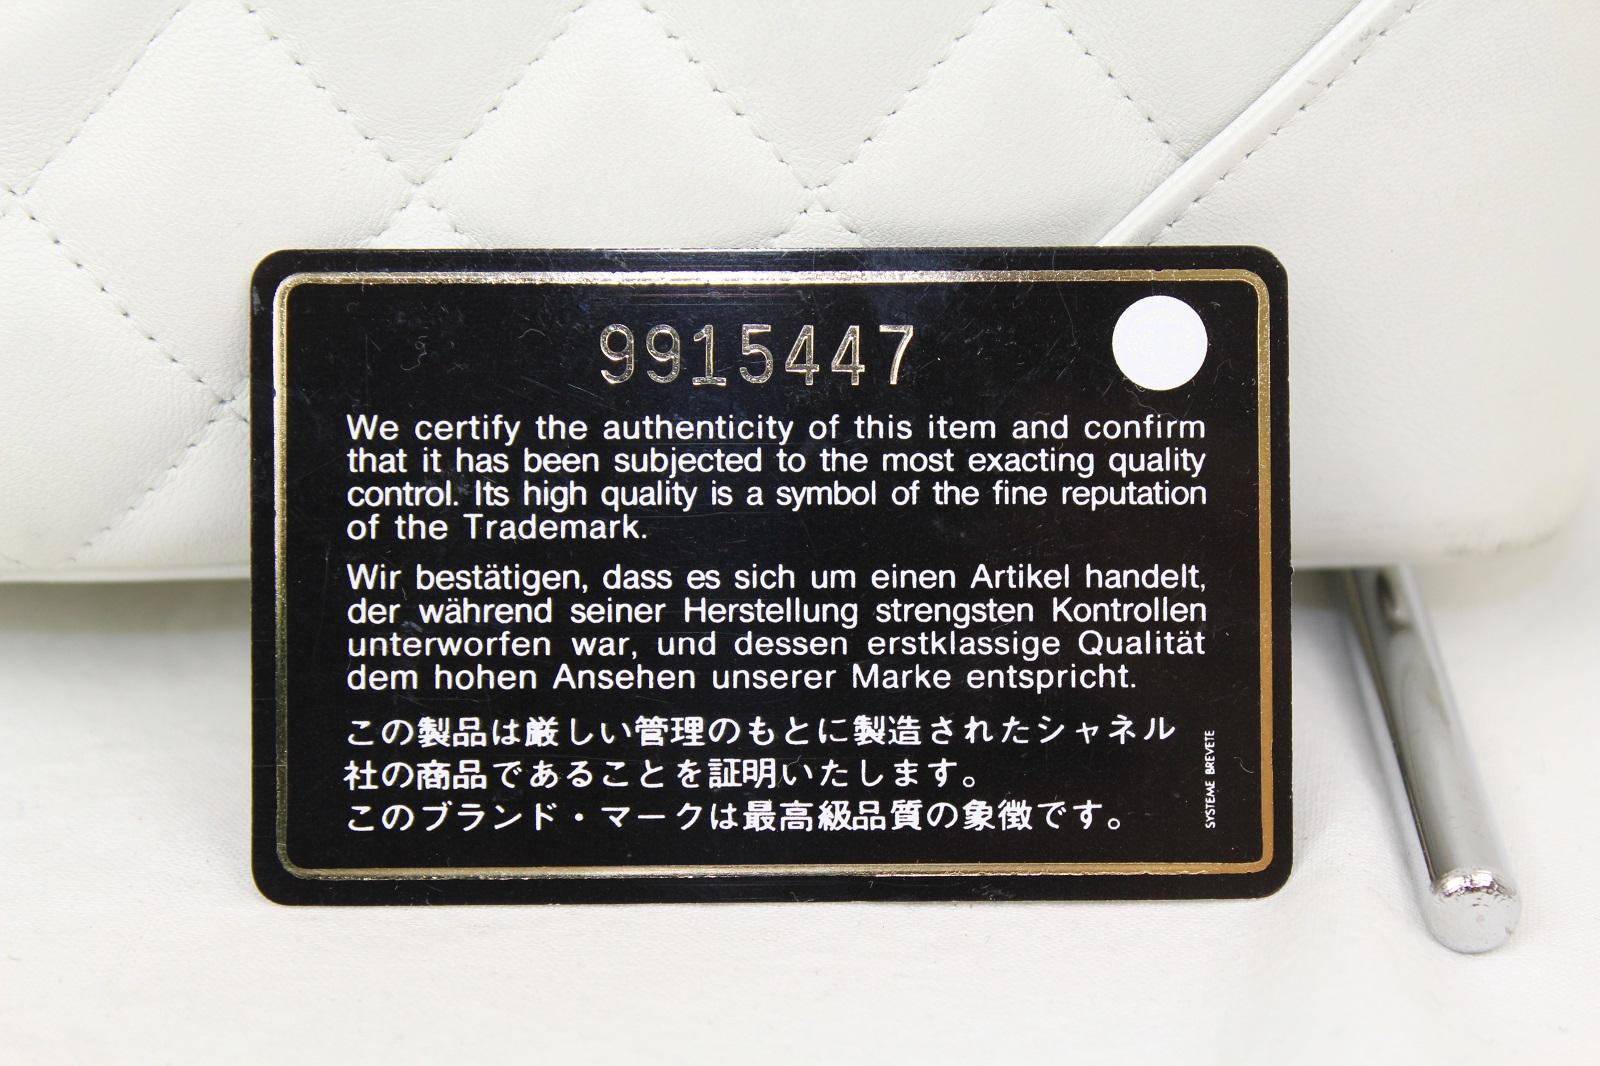 b01401b6b45c 【ギャラあり】CHANELシャネルヴィンテージA25167パイソンカンボントートハンドバッグ